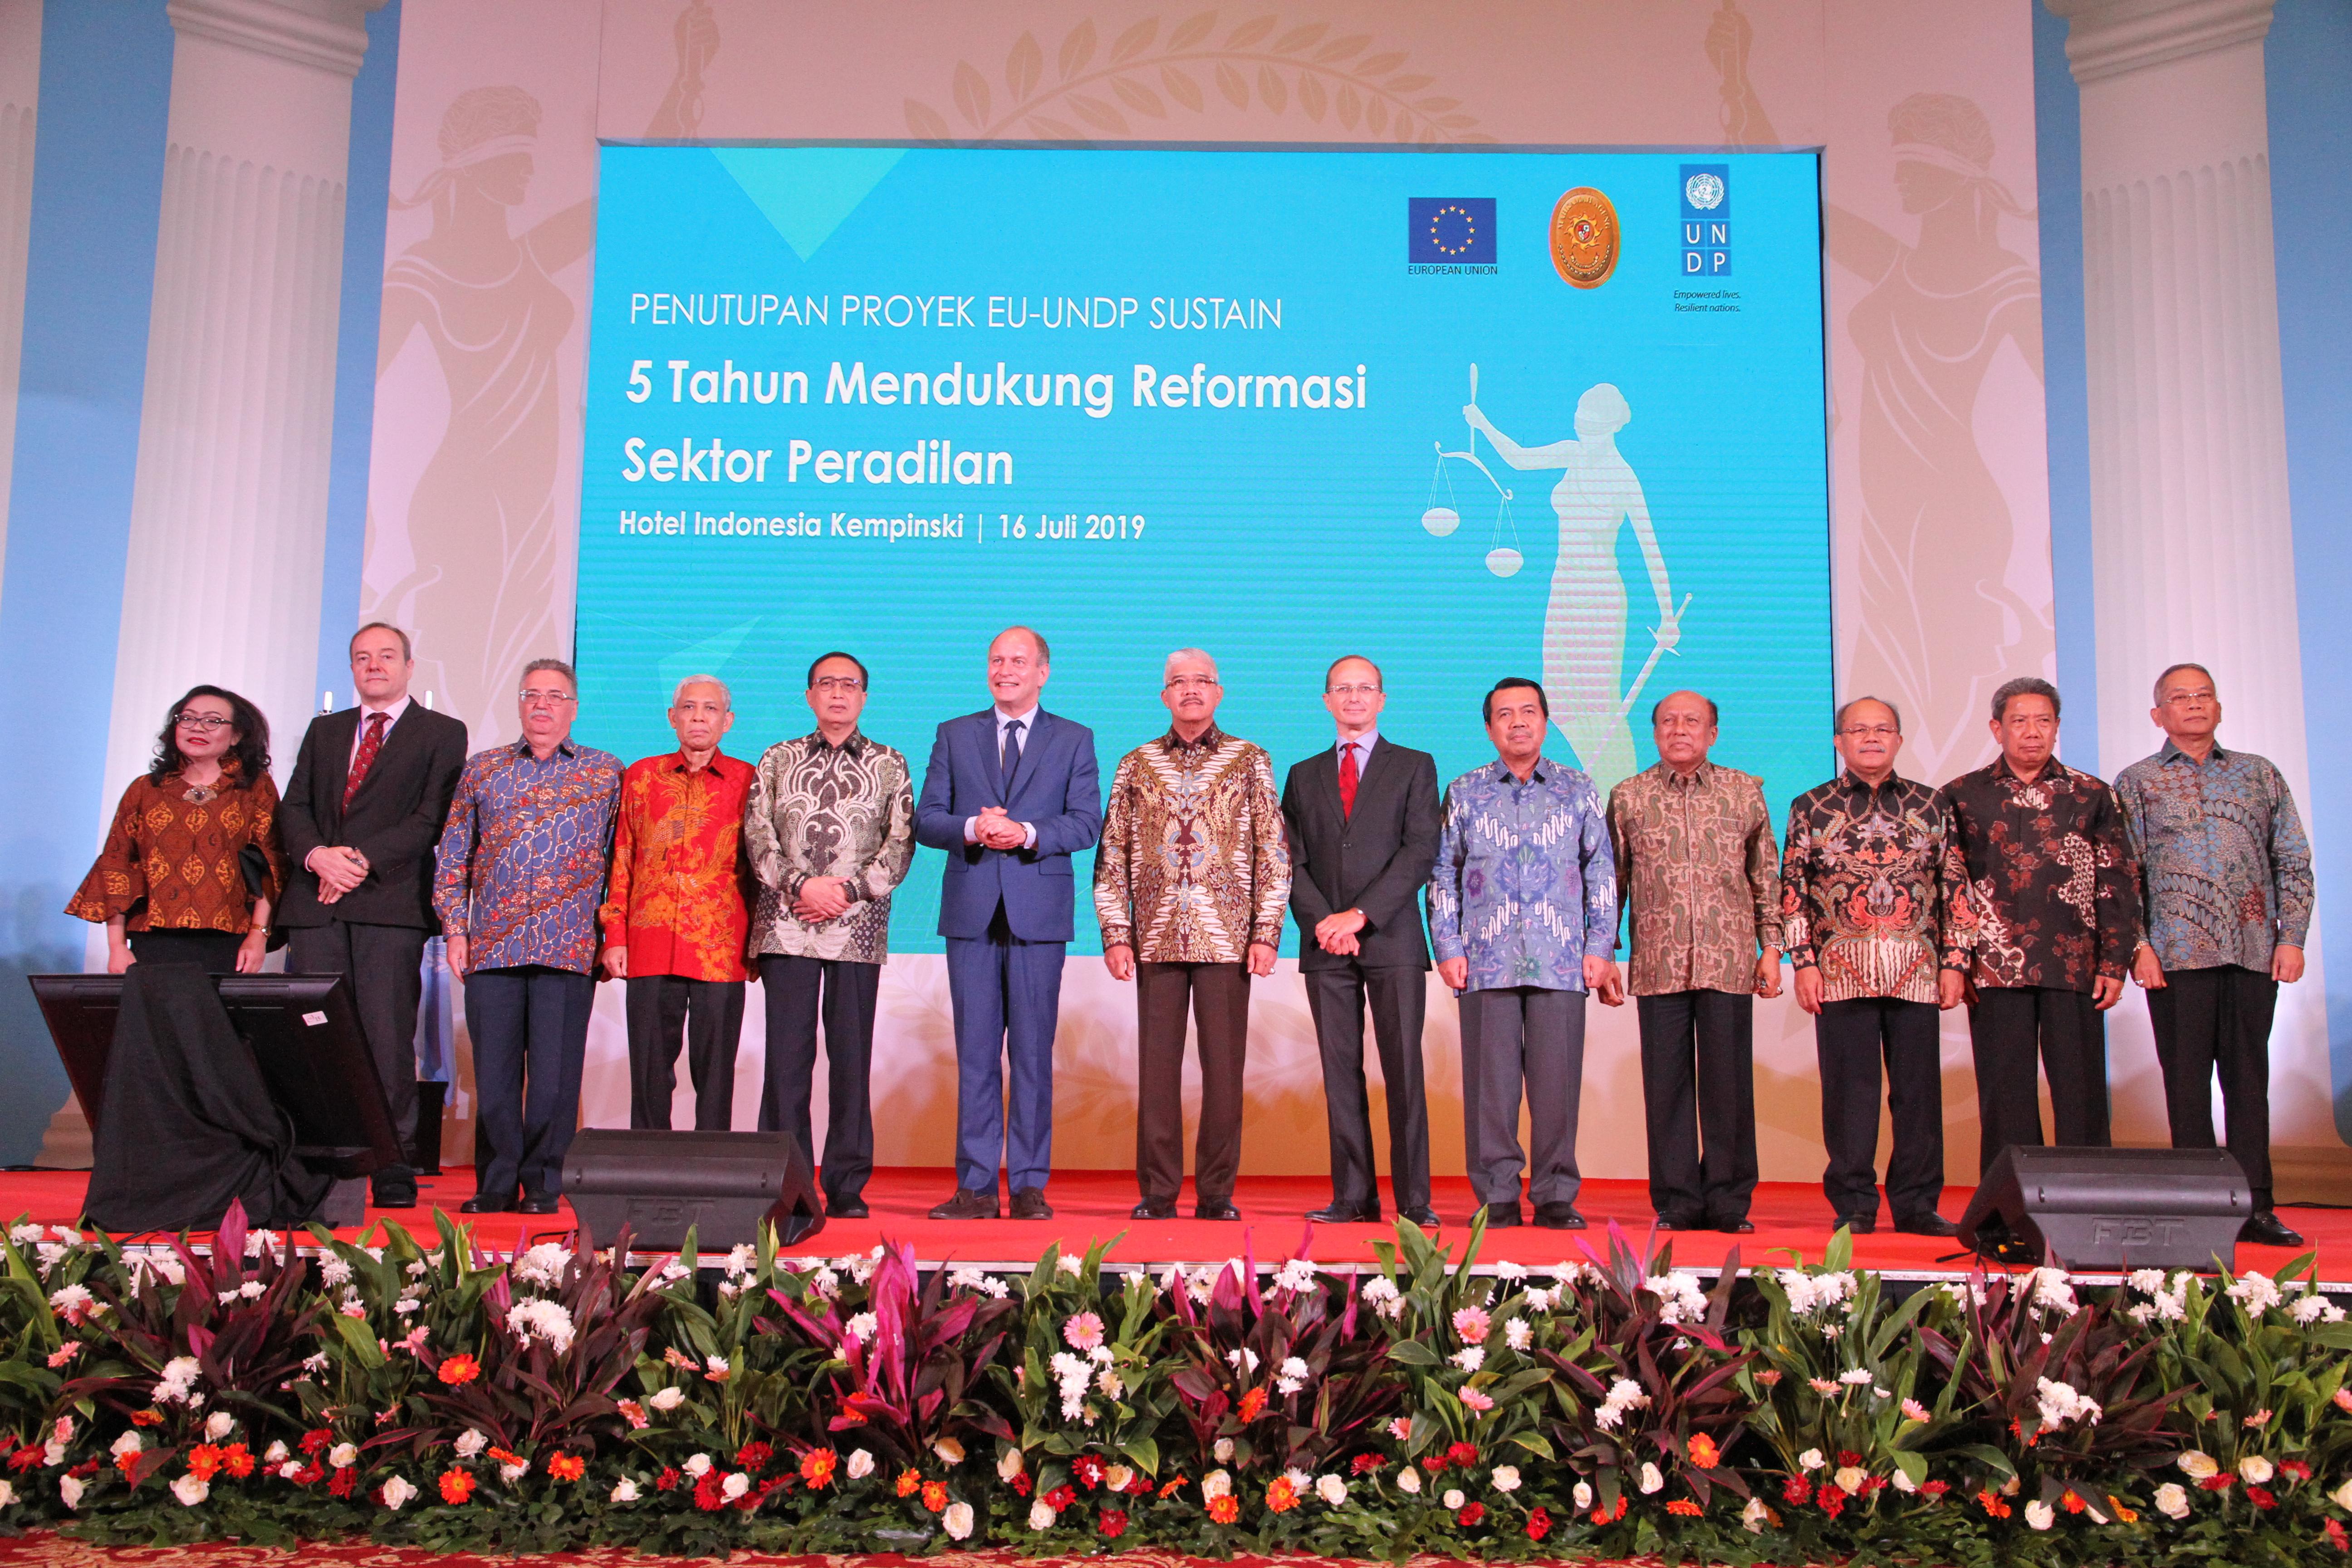 KETUA MAHKAMAH AGUNG RESMI MENUTUP PROYEK SUSTAIN EU-UNDP